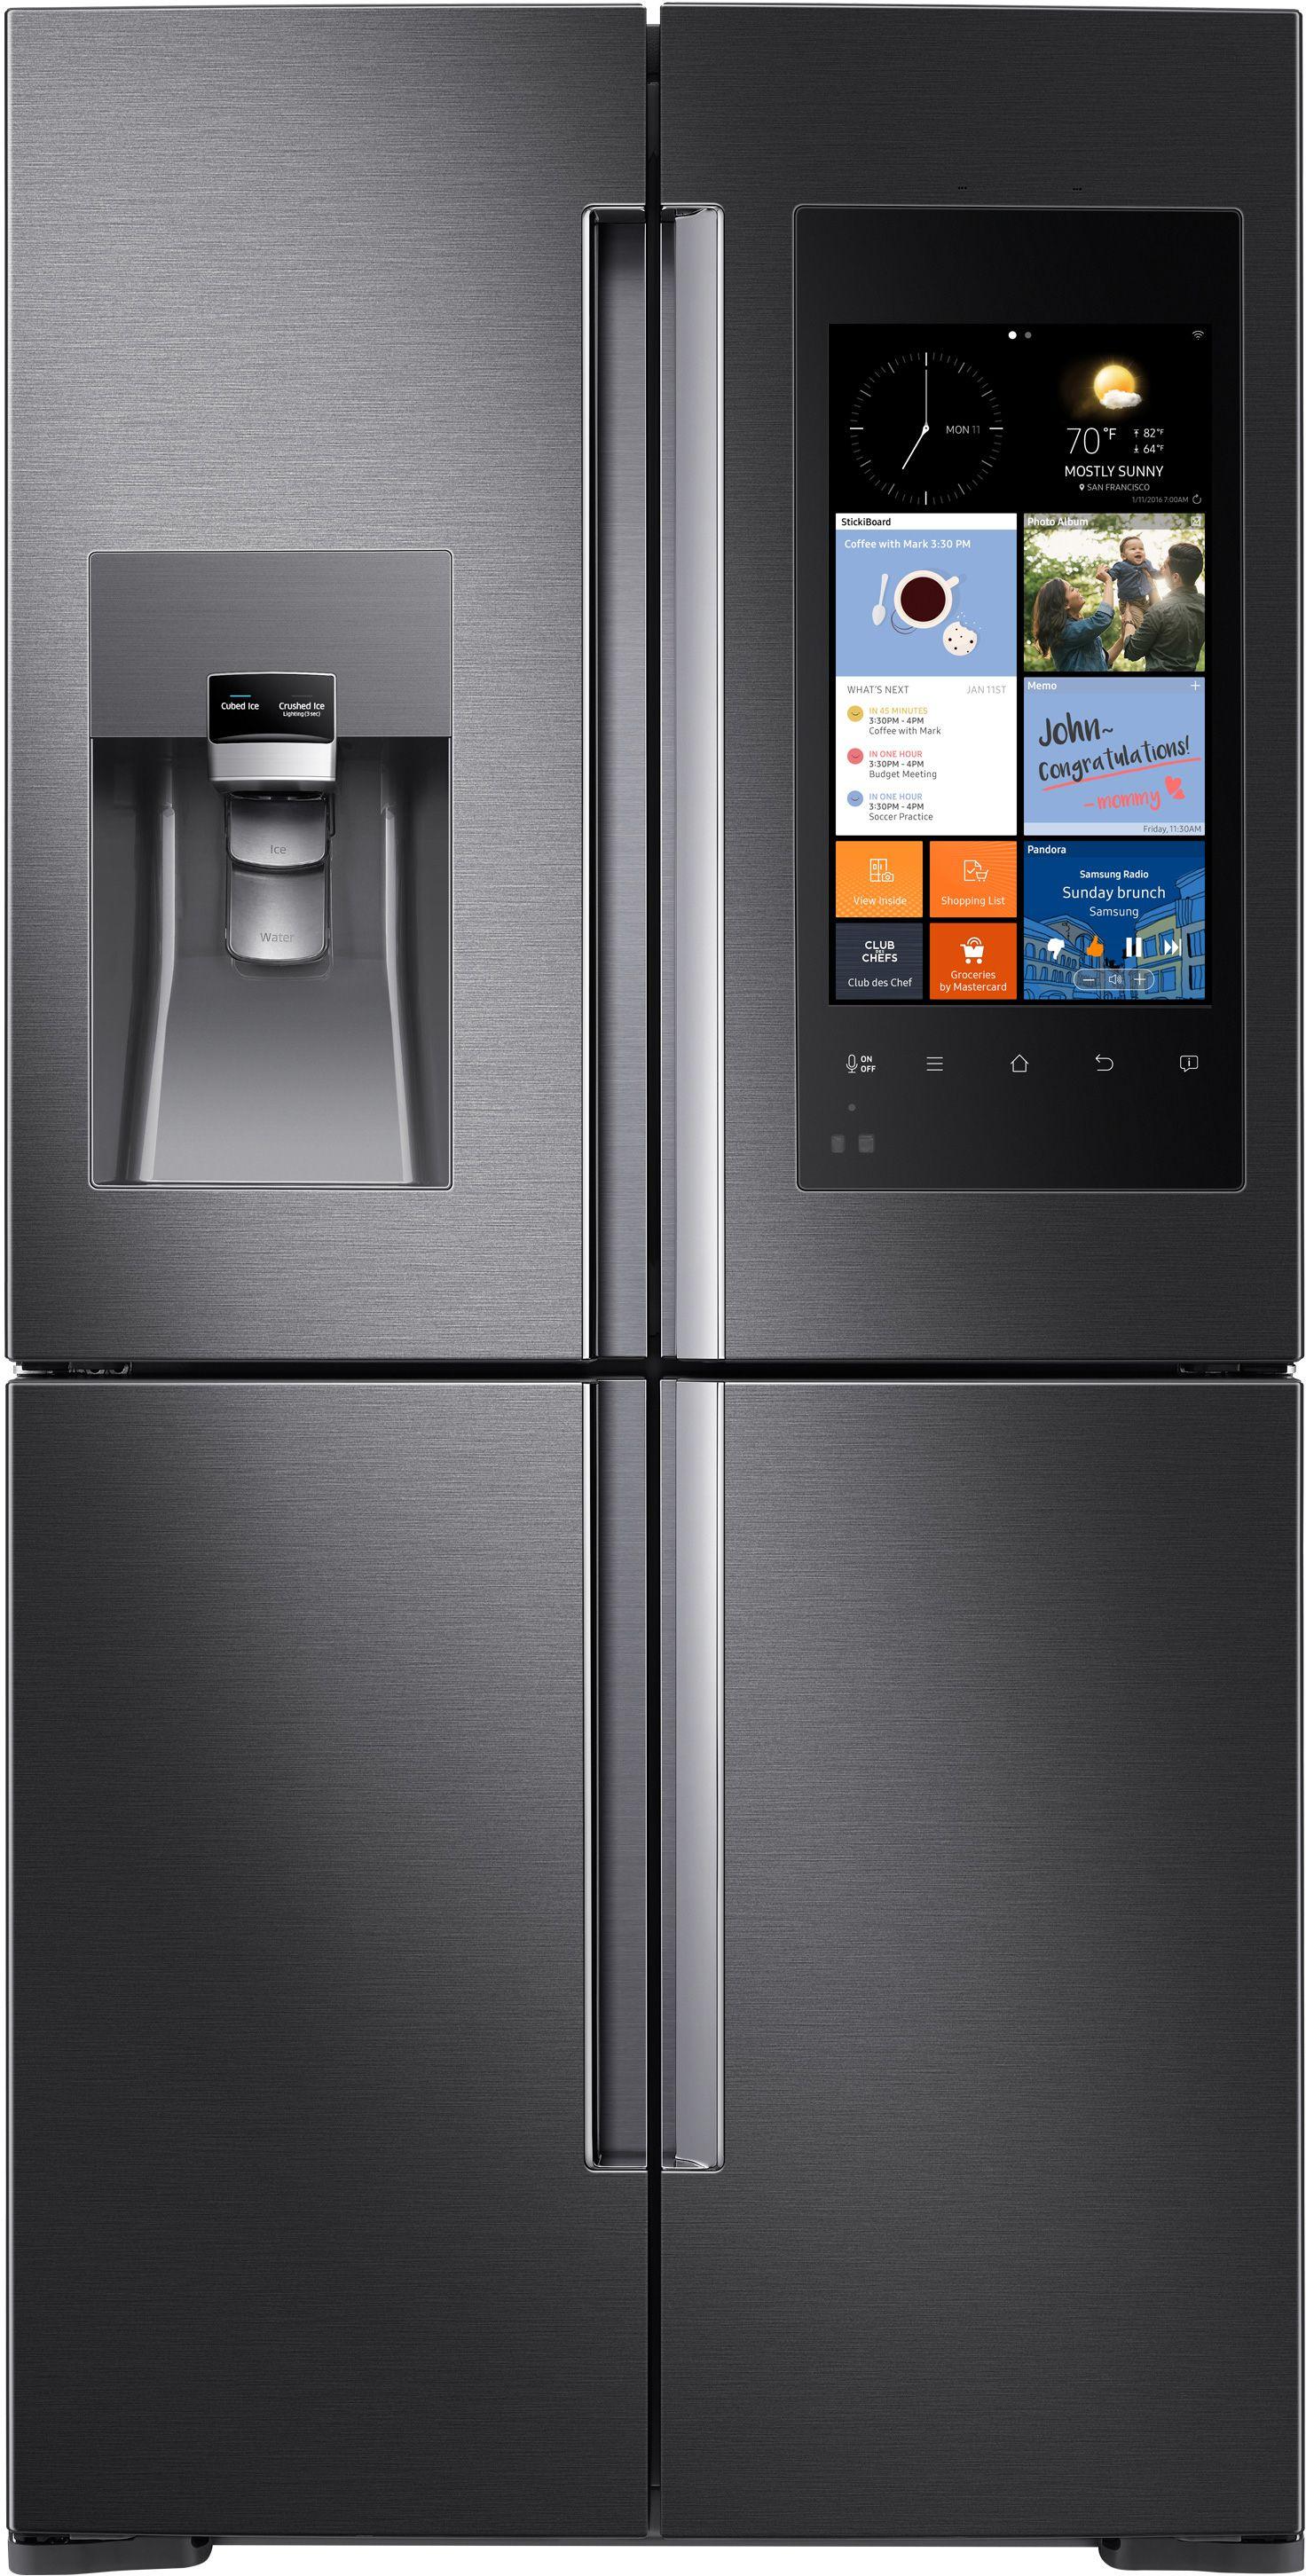 Samsung Appliance Rf28k9580sg Home Appliances Pinterest French